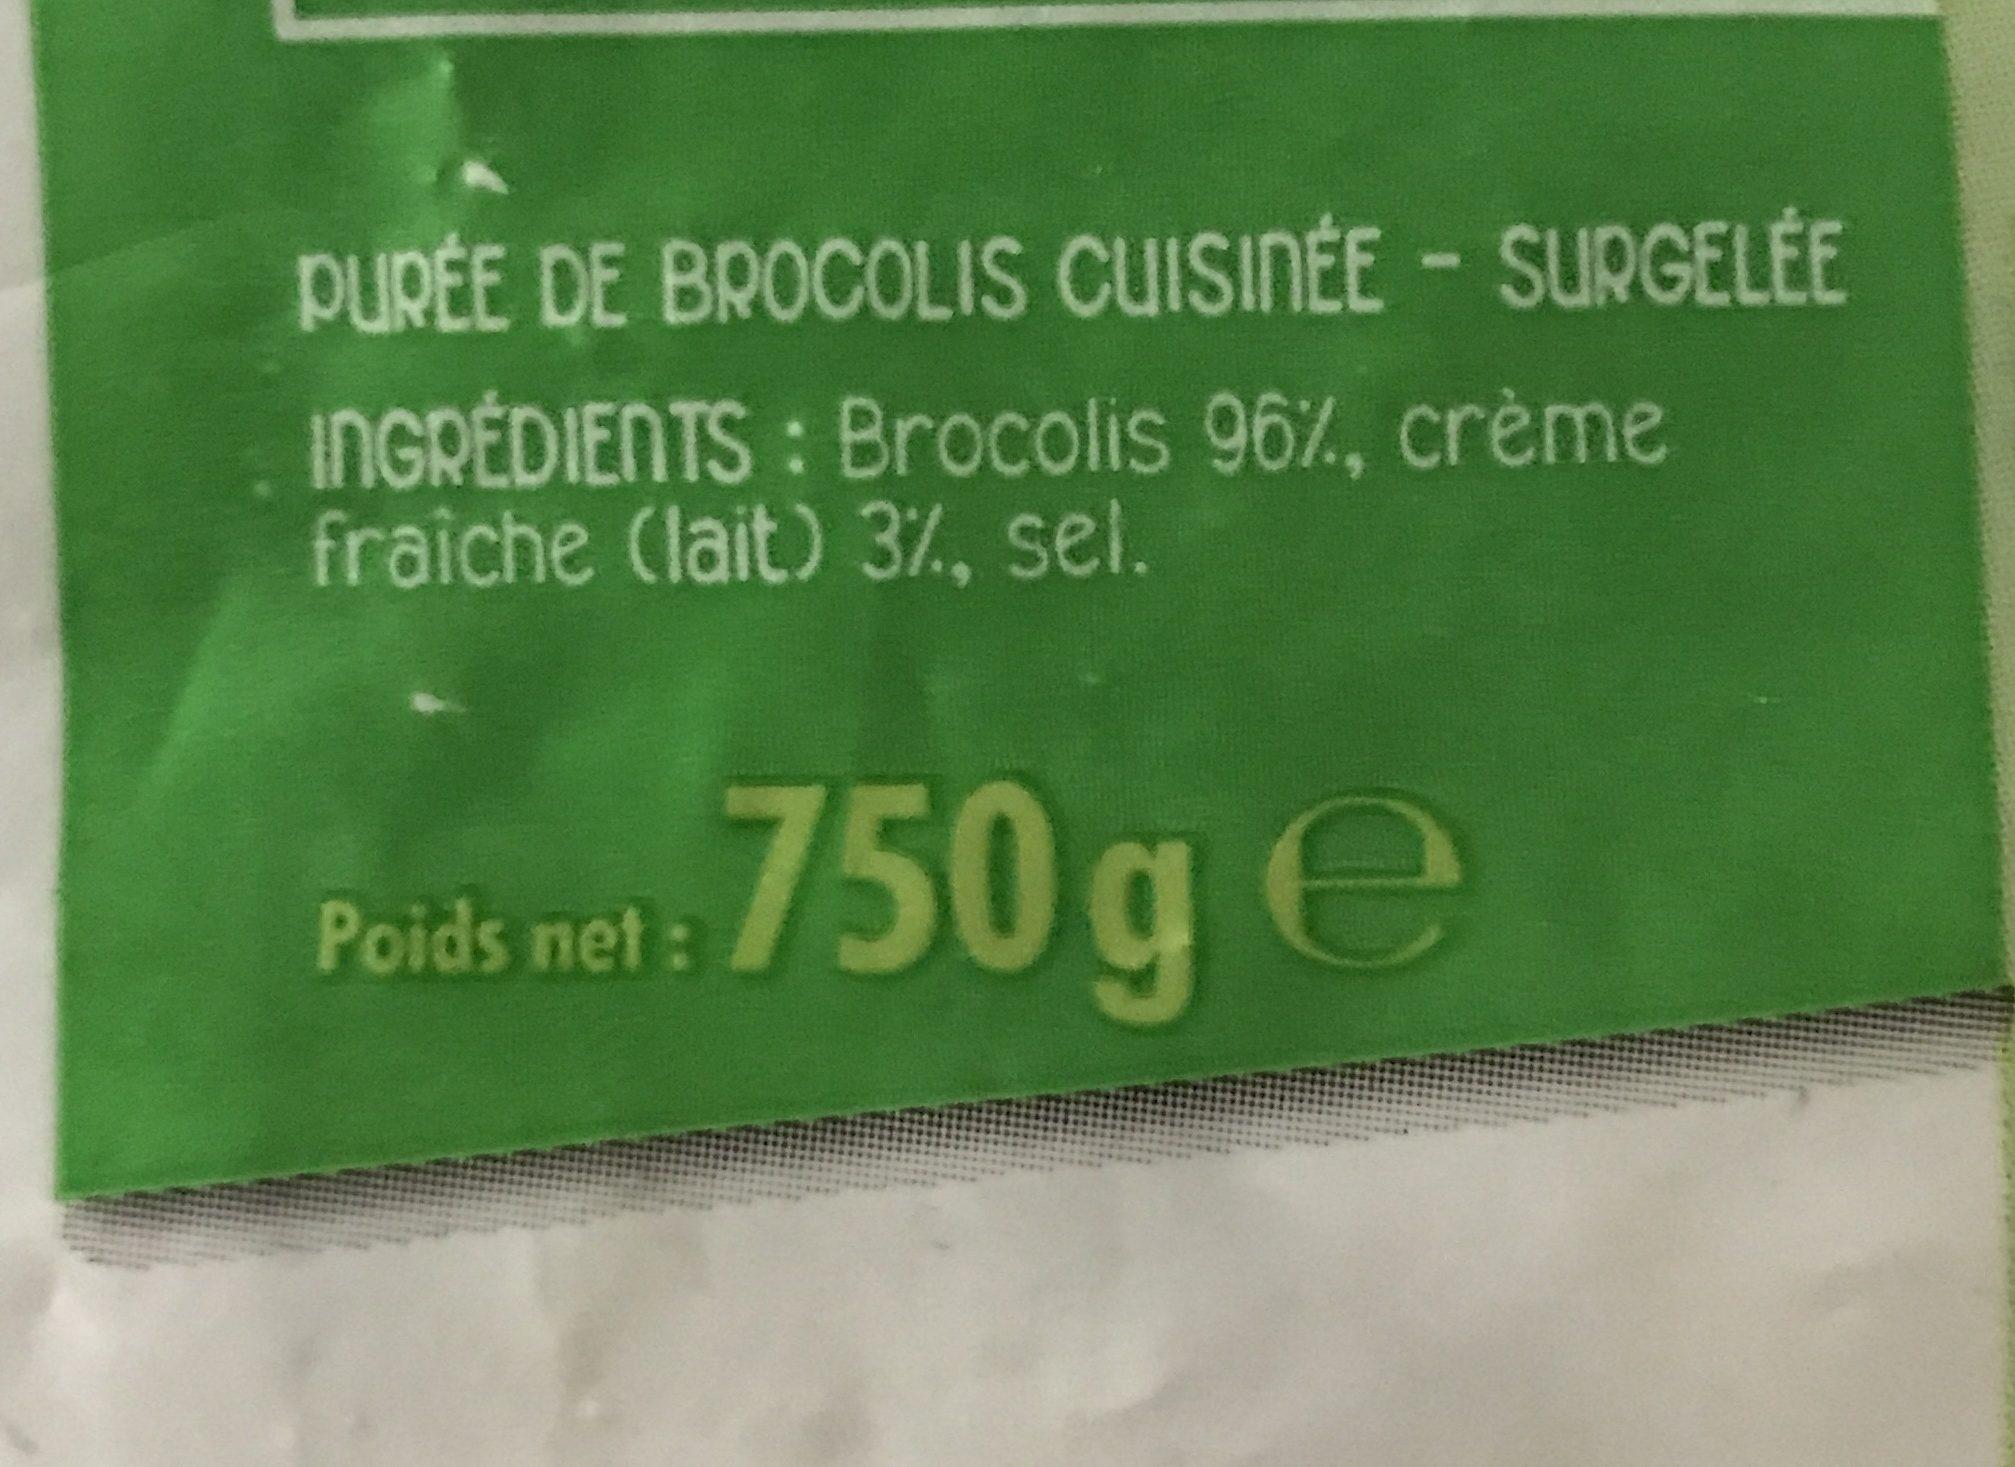 S.eloi Puree Broco Cuis - Ingrédients - fr